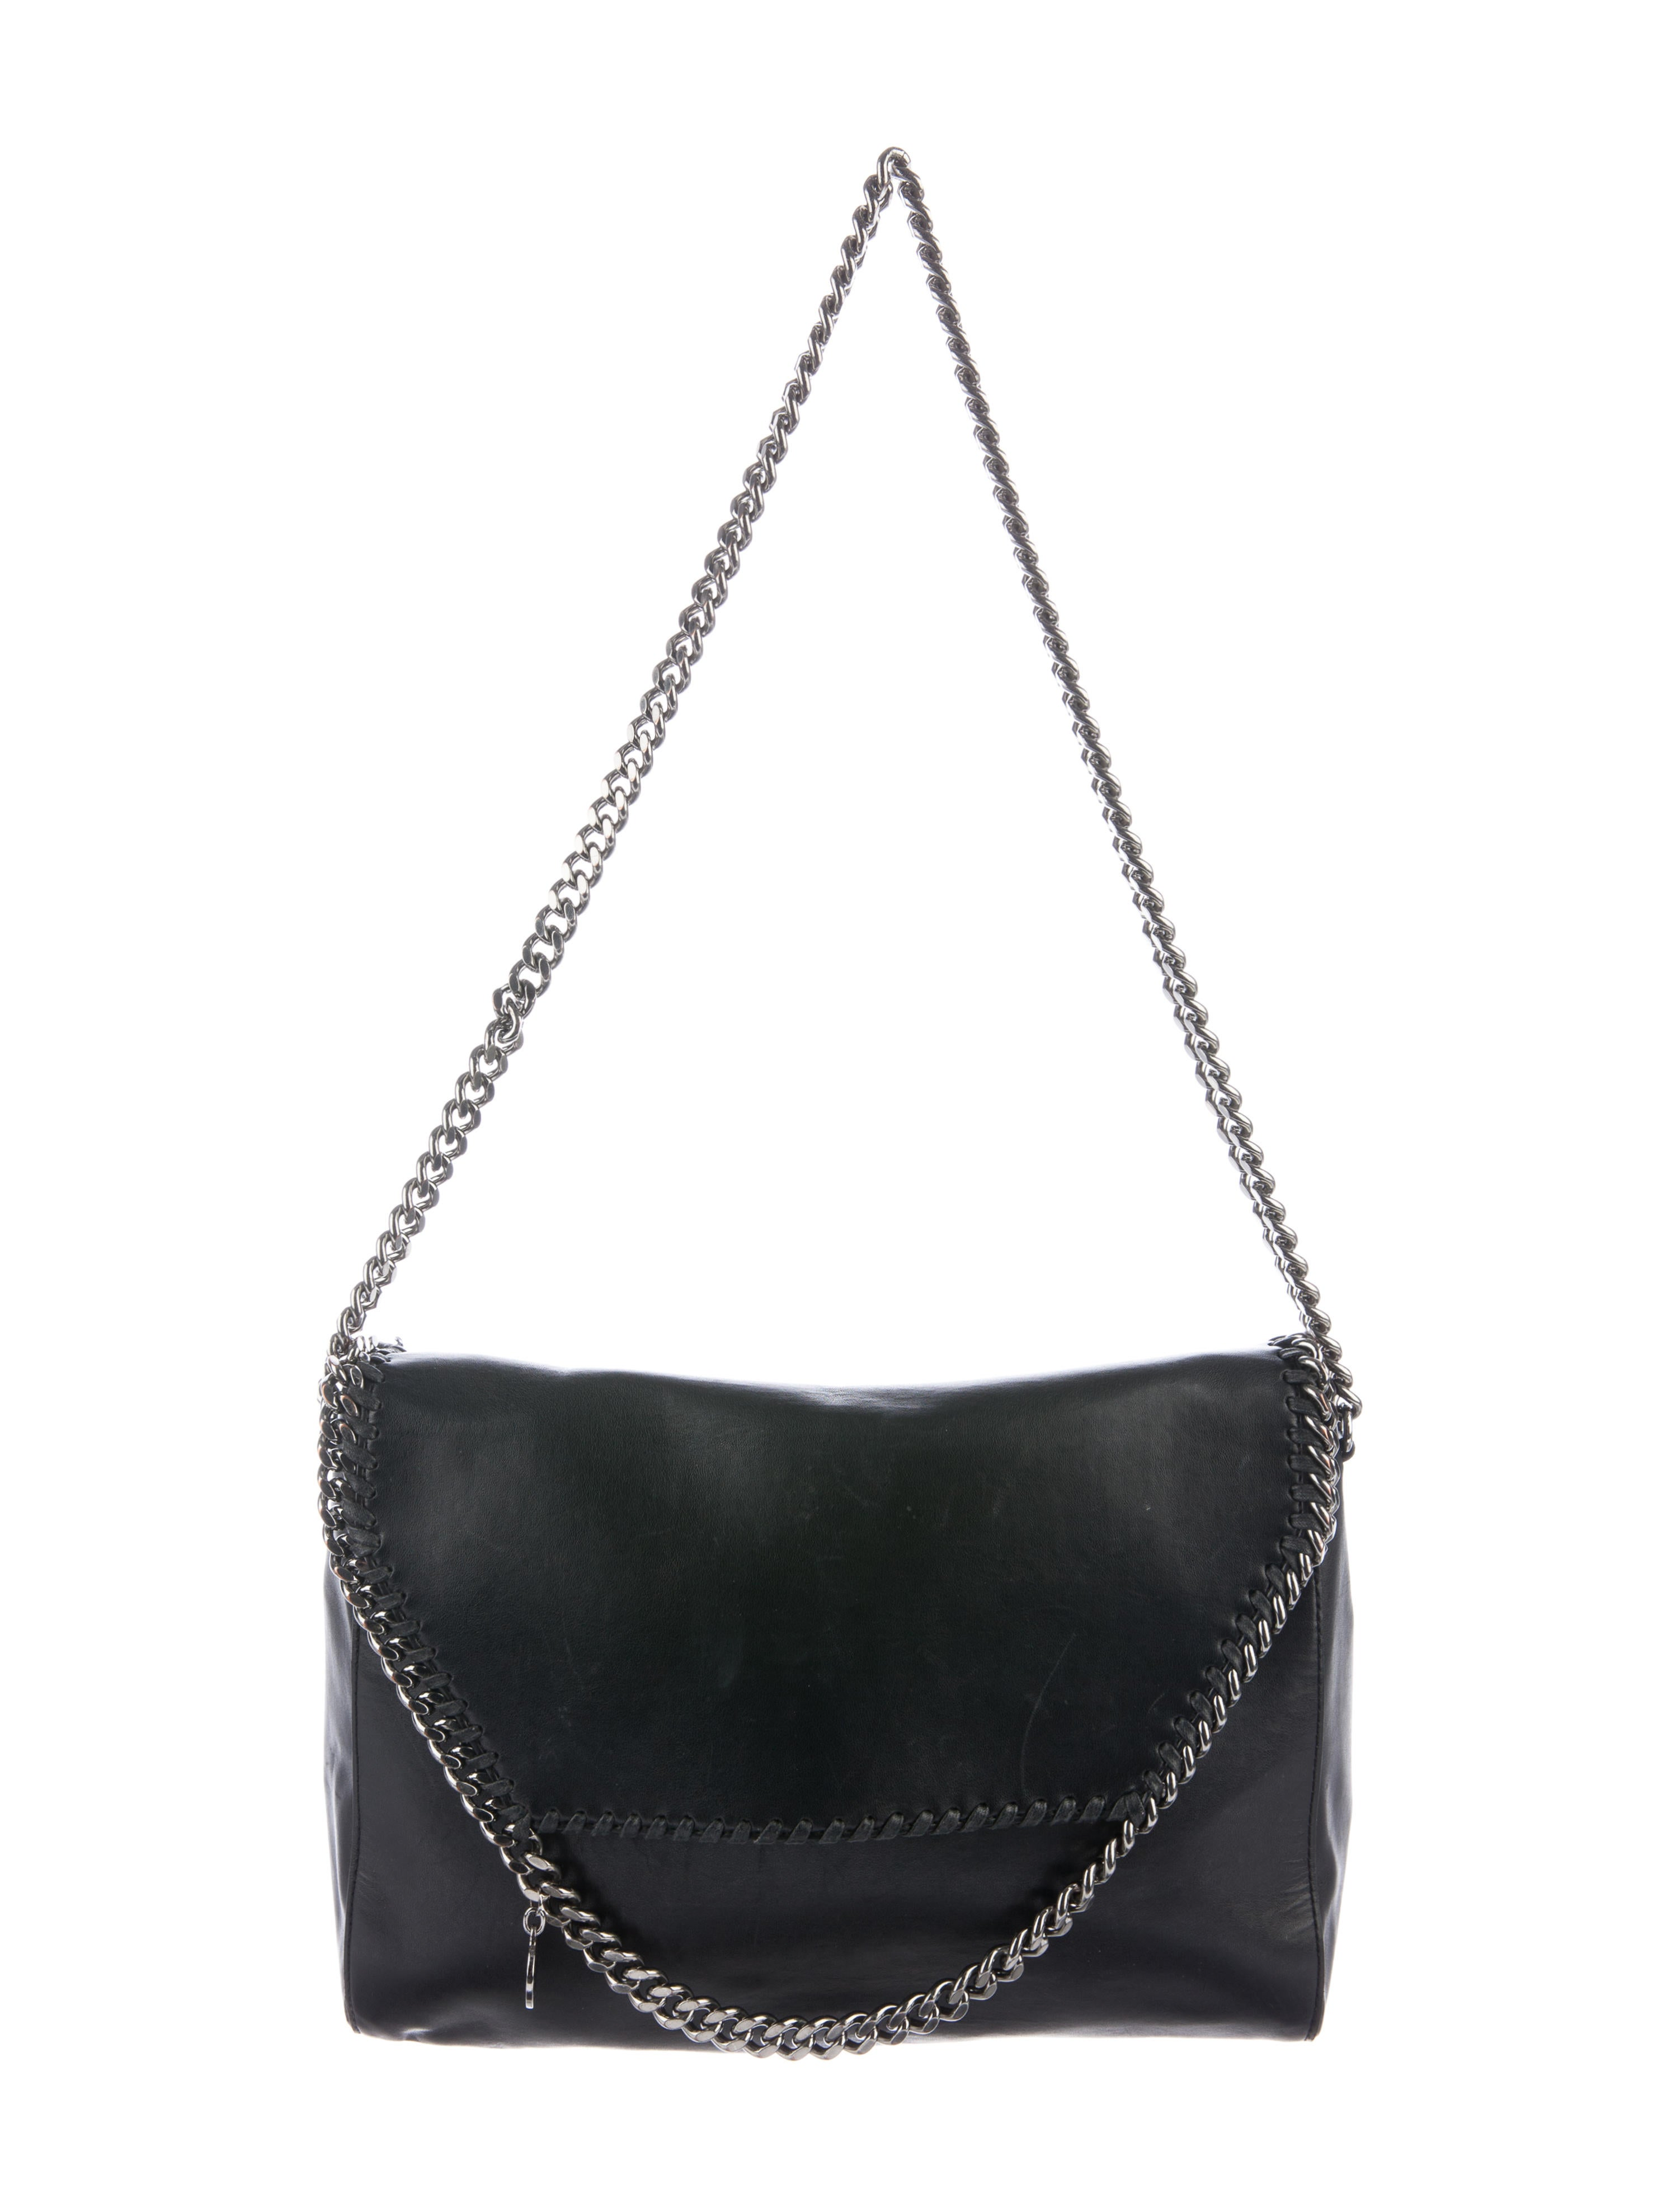 stella mccartney falabella shoulder bag handbags stl57792 the realreal. Black Bedroom Furniture Sets. Home Design Ideas